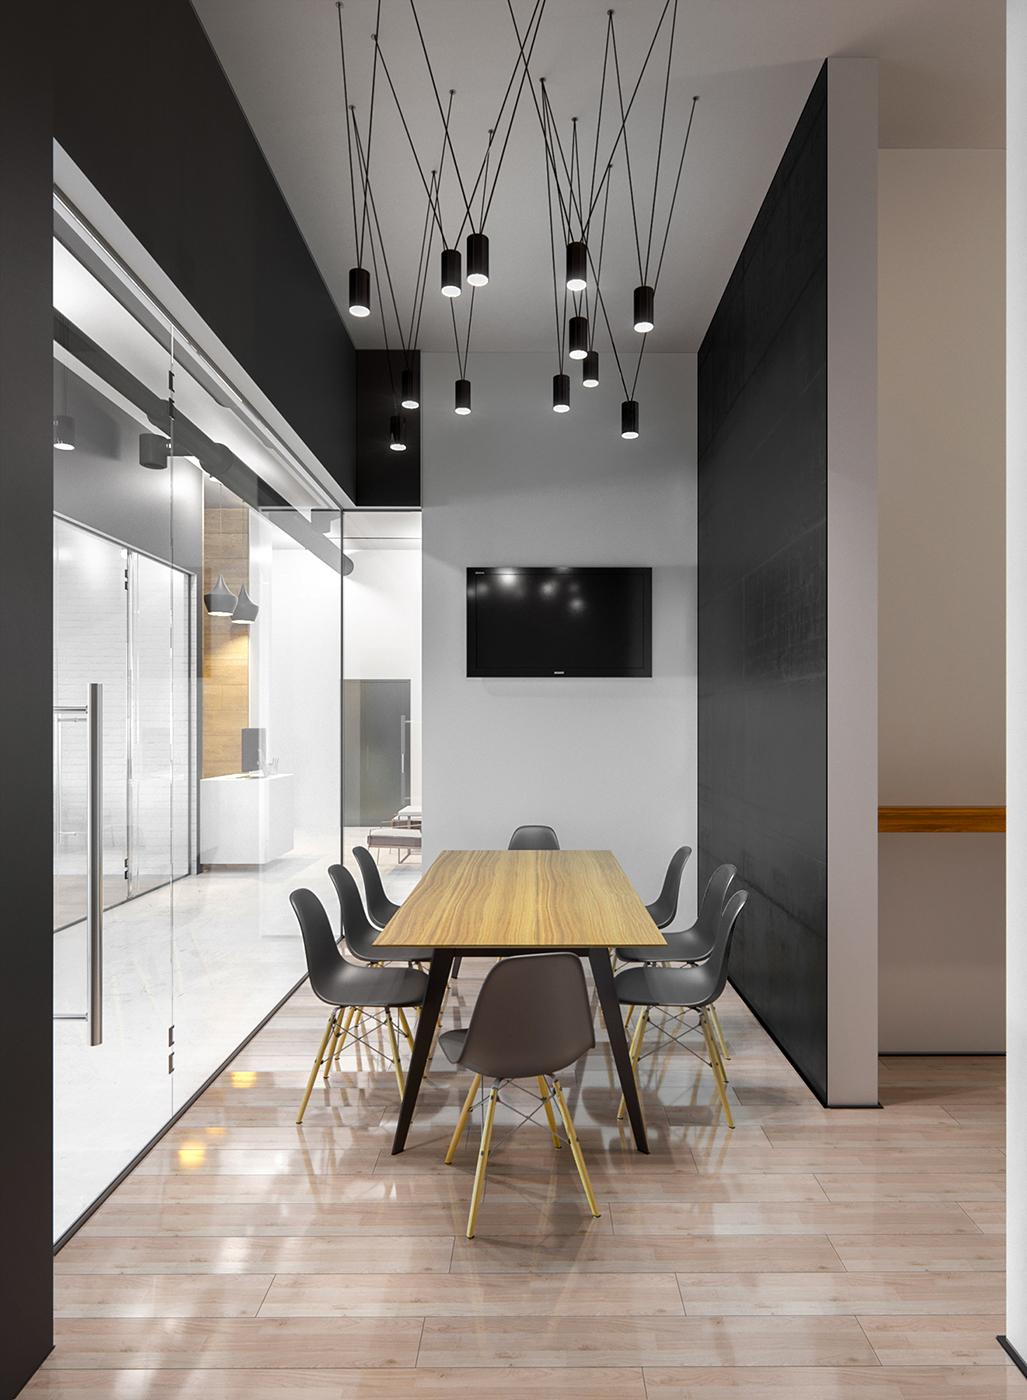 Concept Office design on Behance